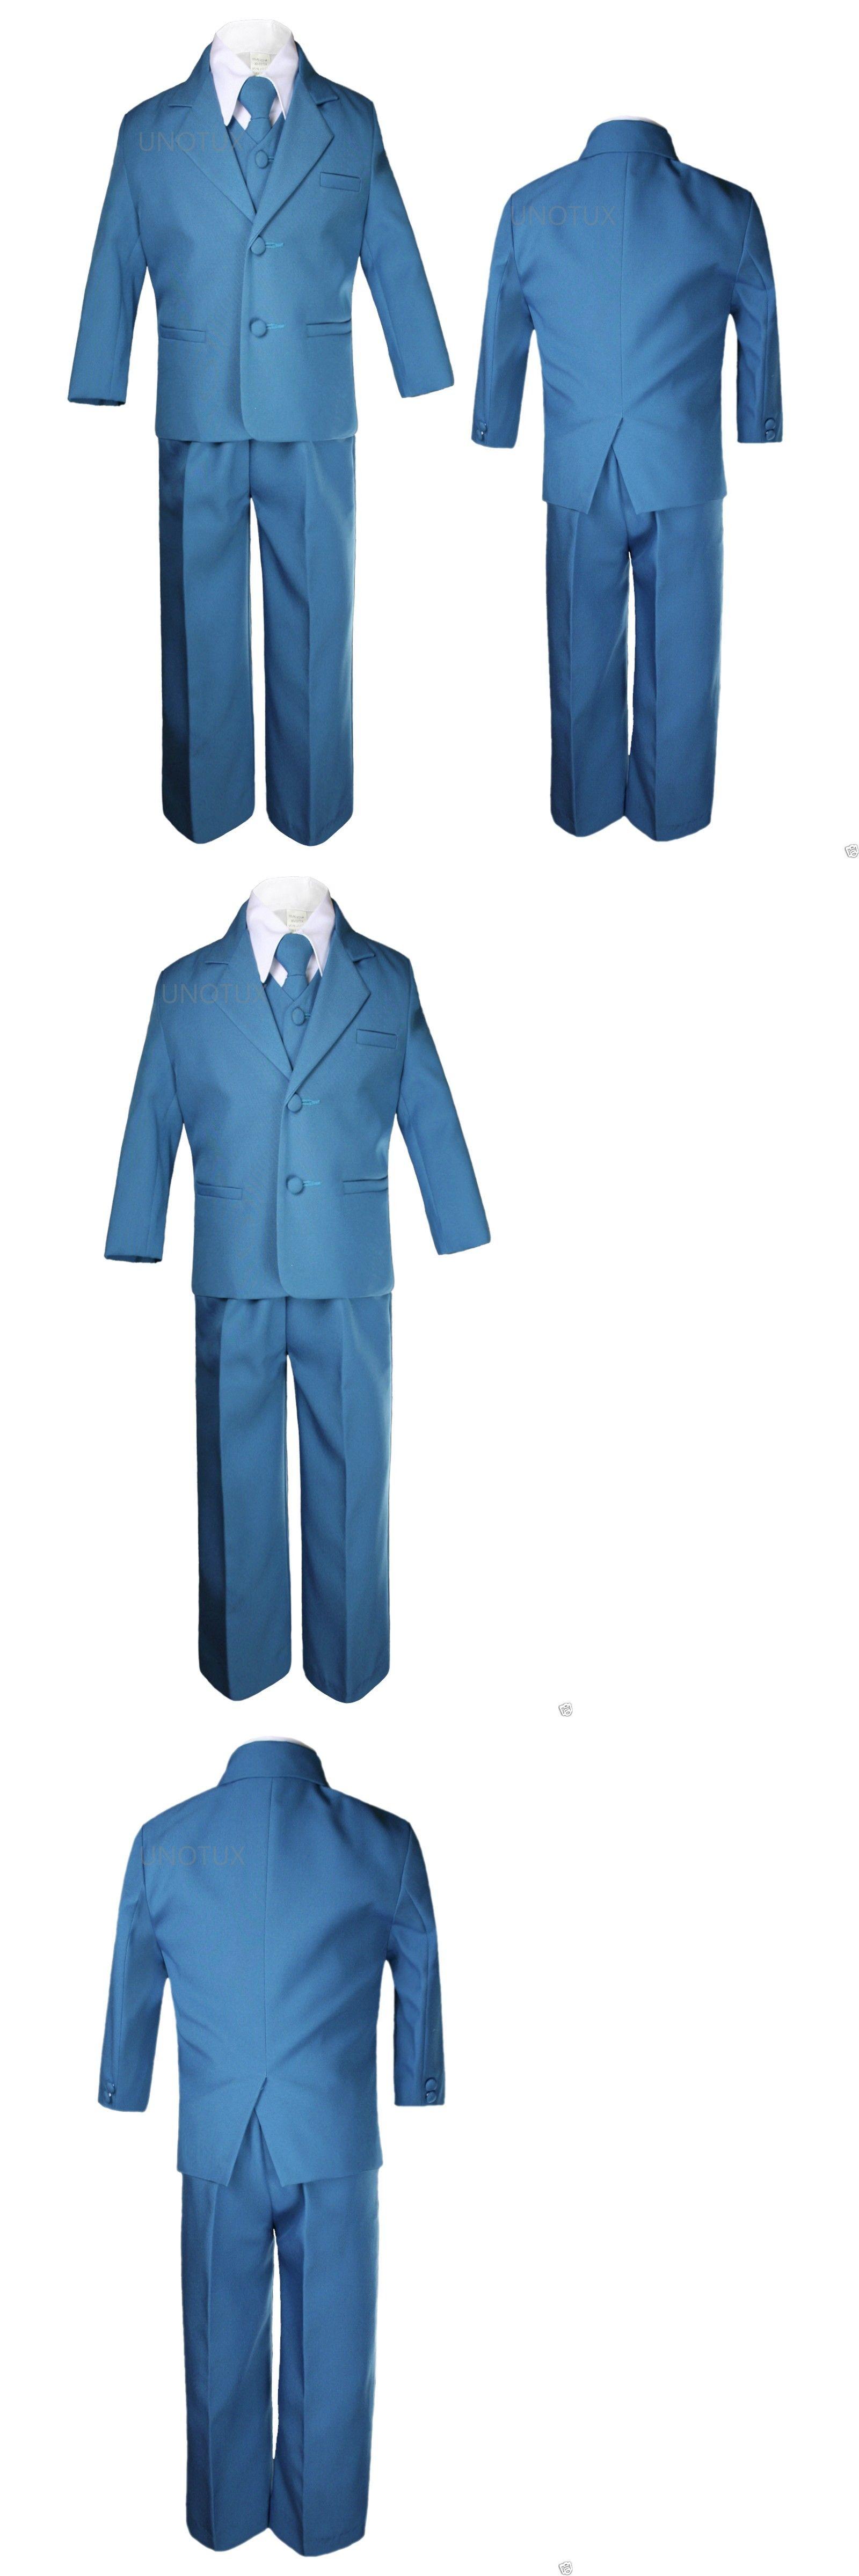 Suits 147337: Baby Toddler Kid Teen Formal Wedding Green Teal ...